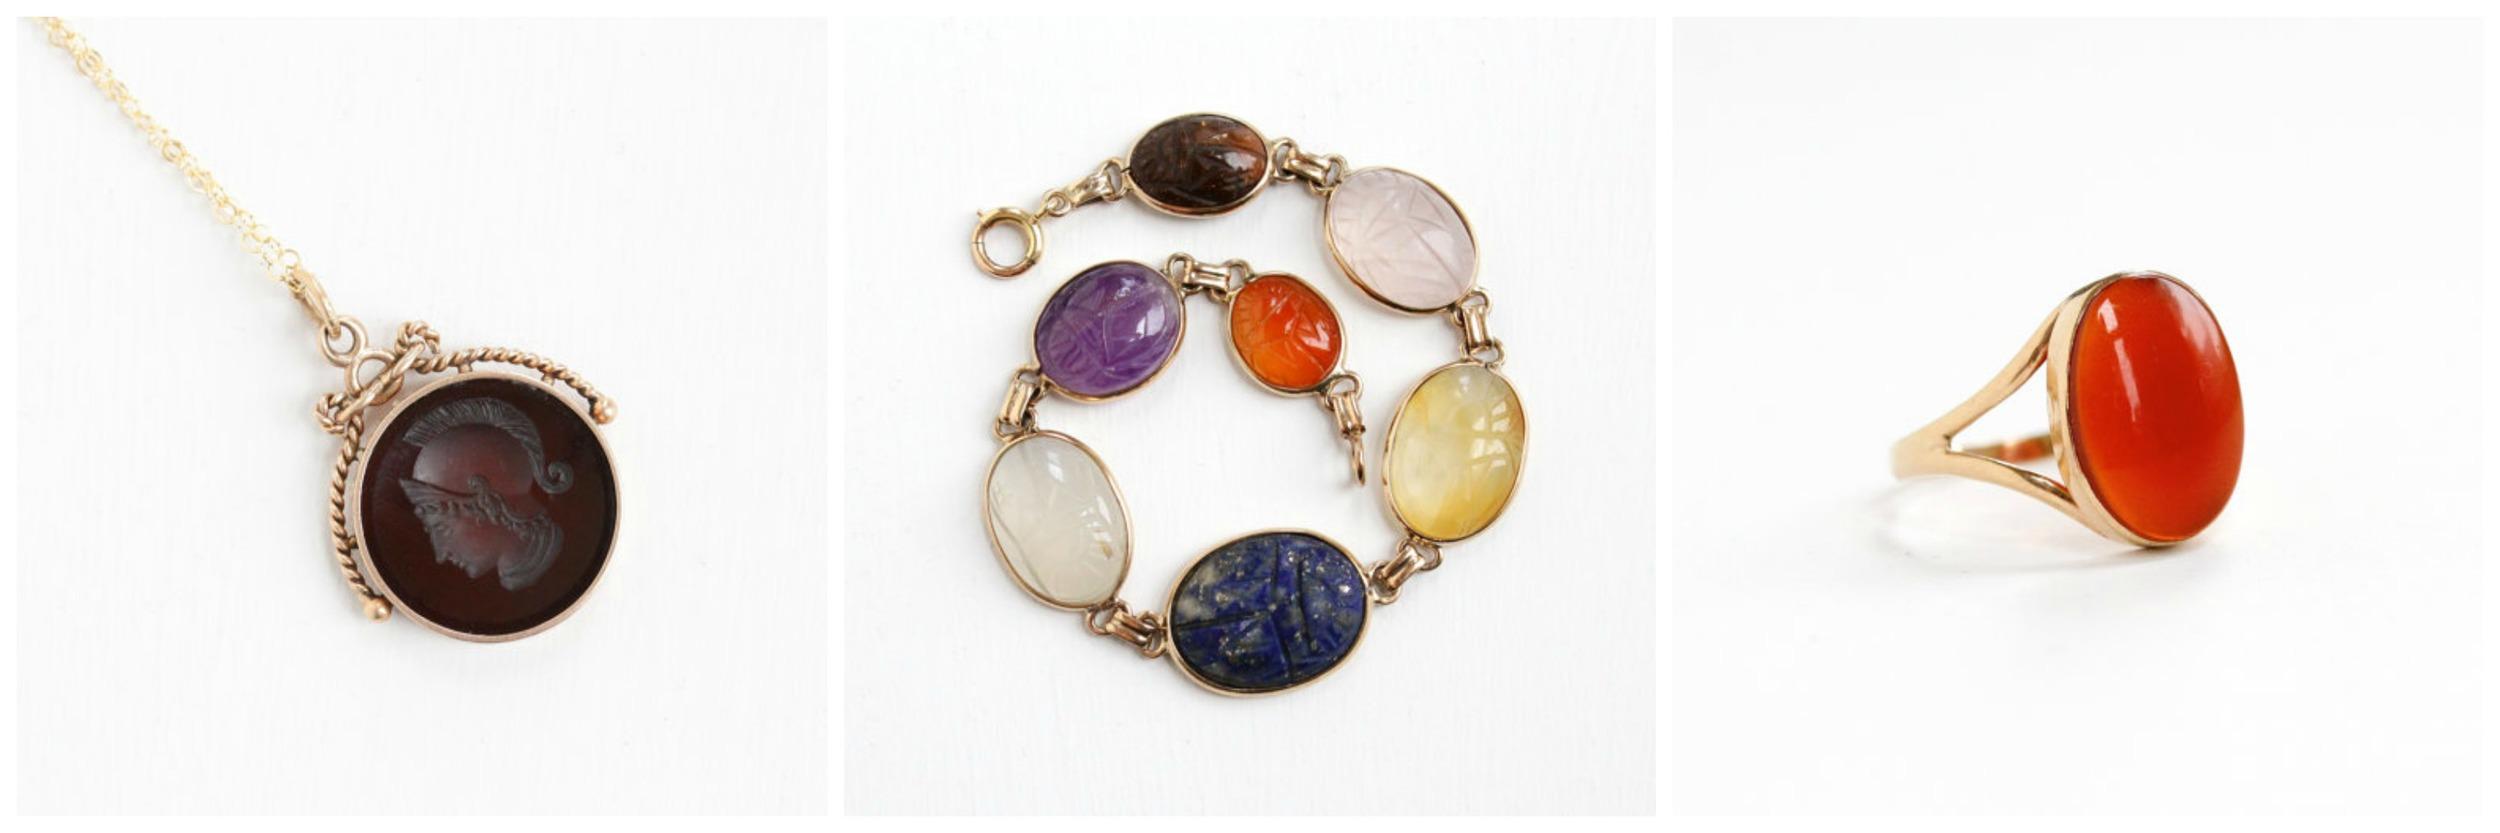 Antique  Carnelian Fob , Scarab  Carnelian Bracelet , Antique  Carnelian Ring